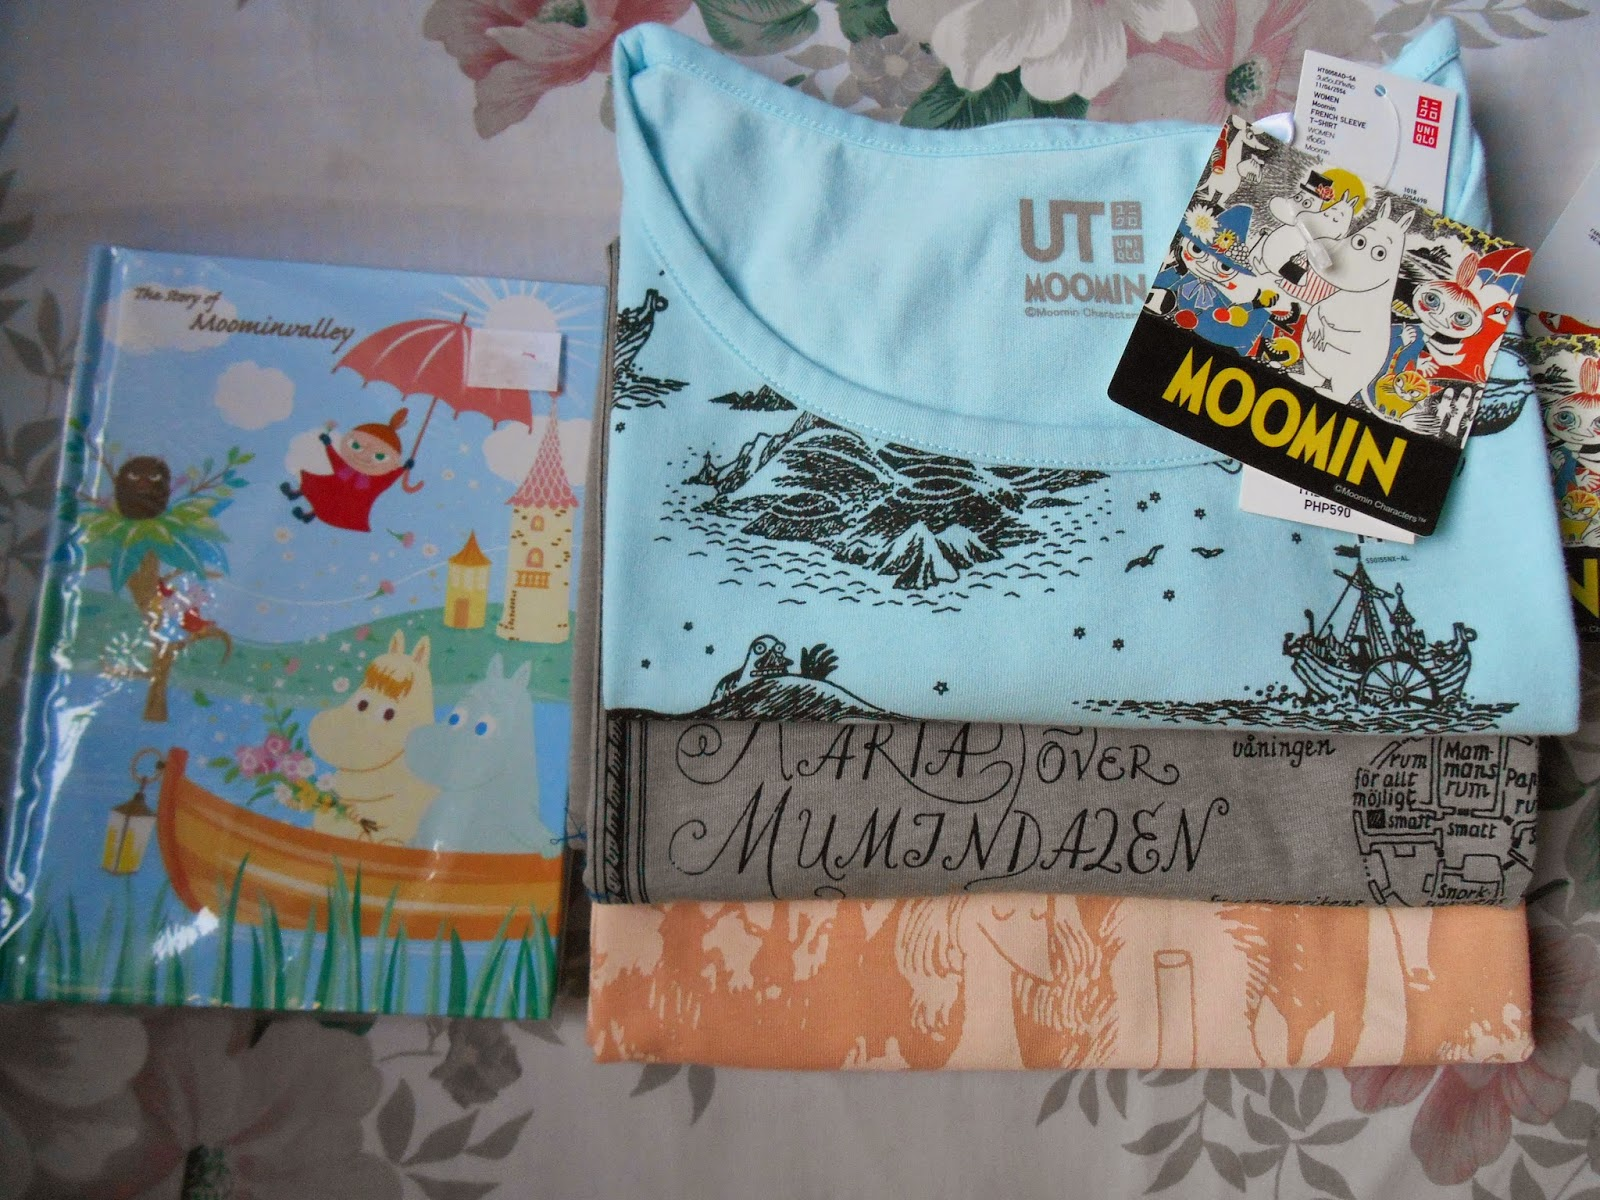 Uniqlo UT Moomin Women's T-shirts and Moomin Diary